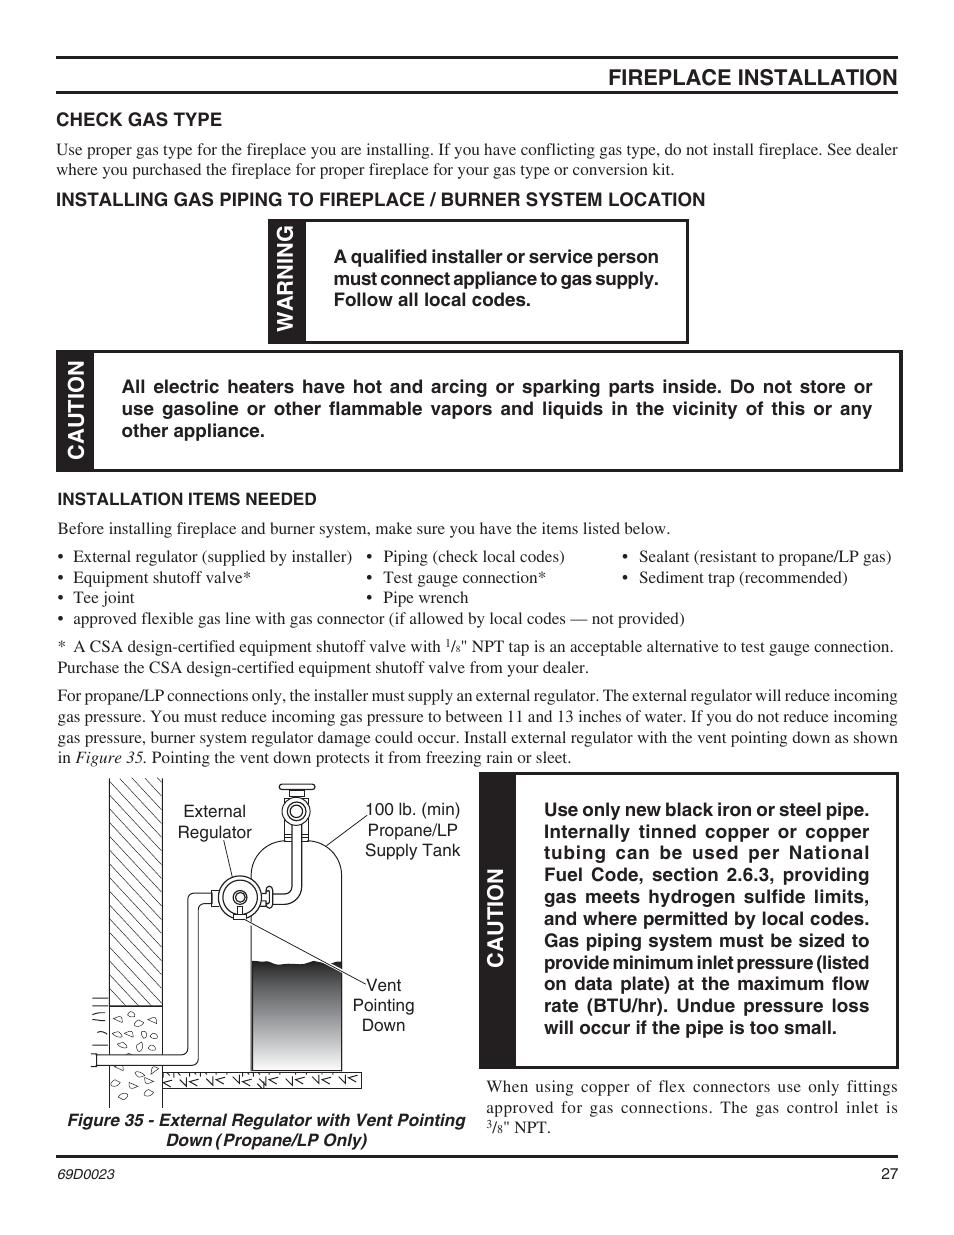 Fireplace Installation  Warning  Caution